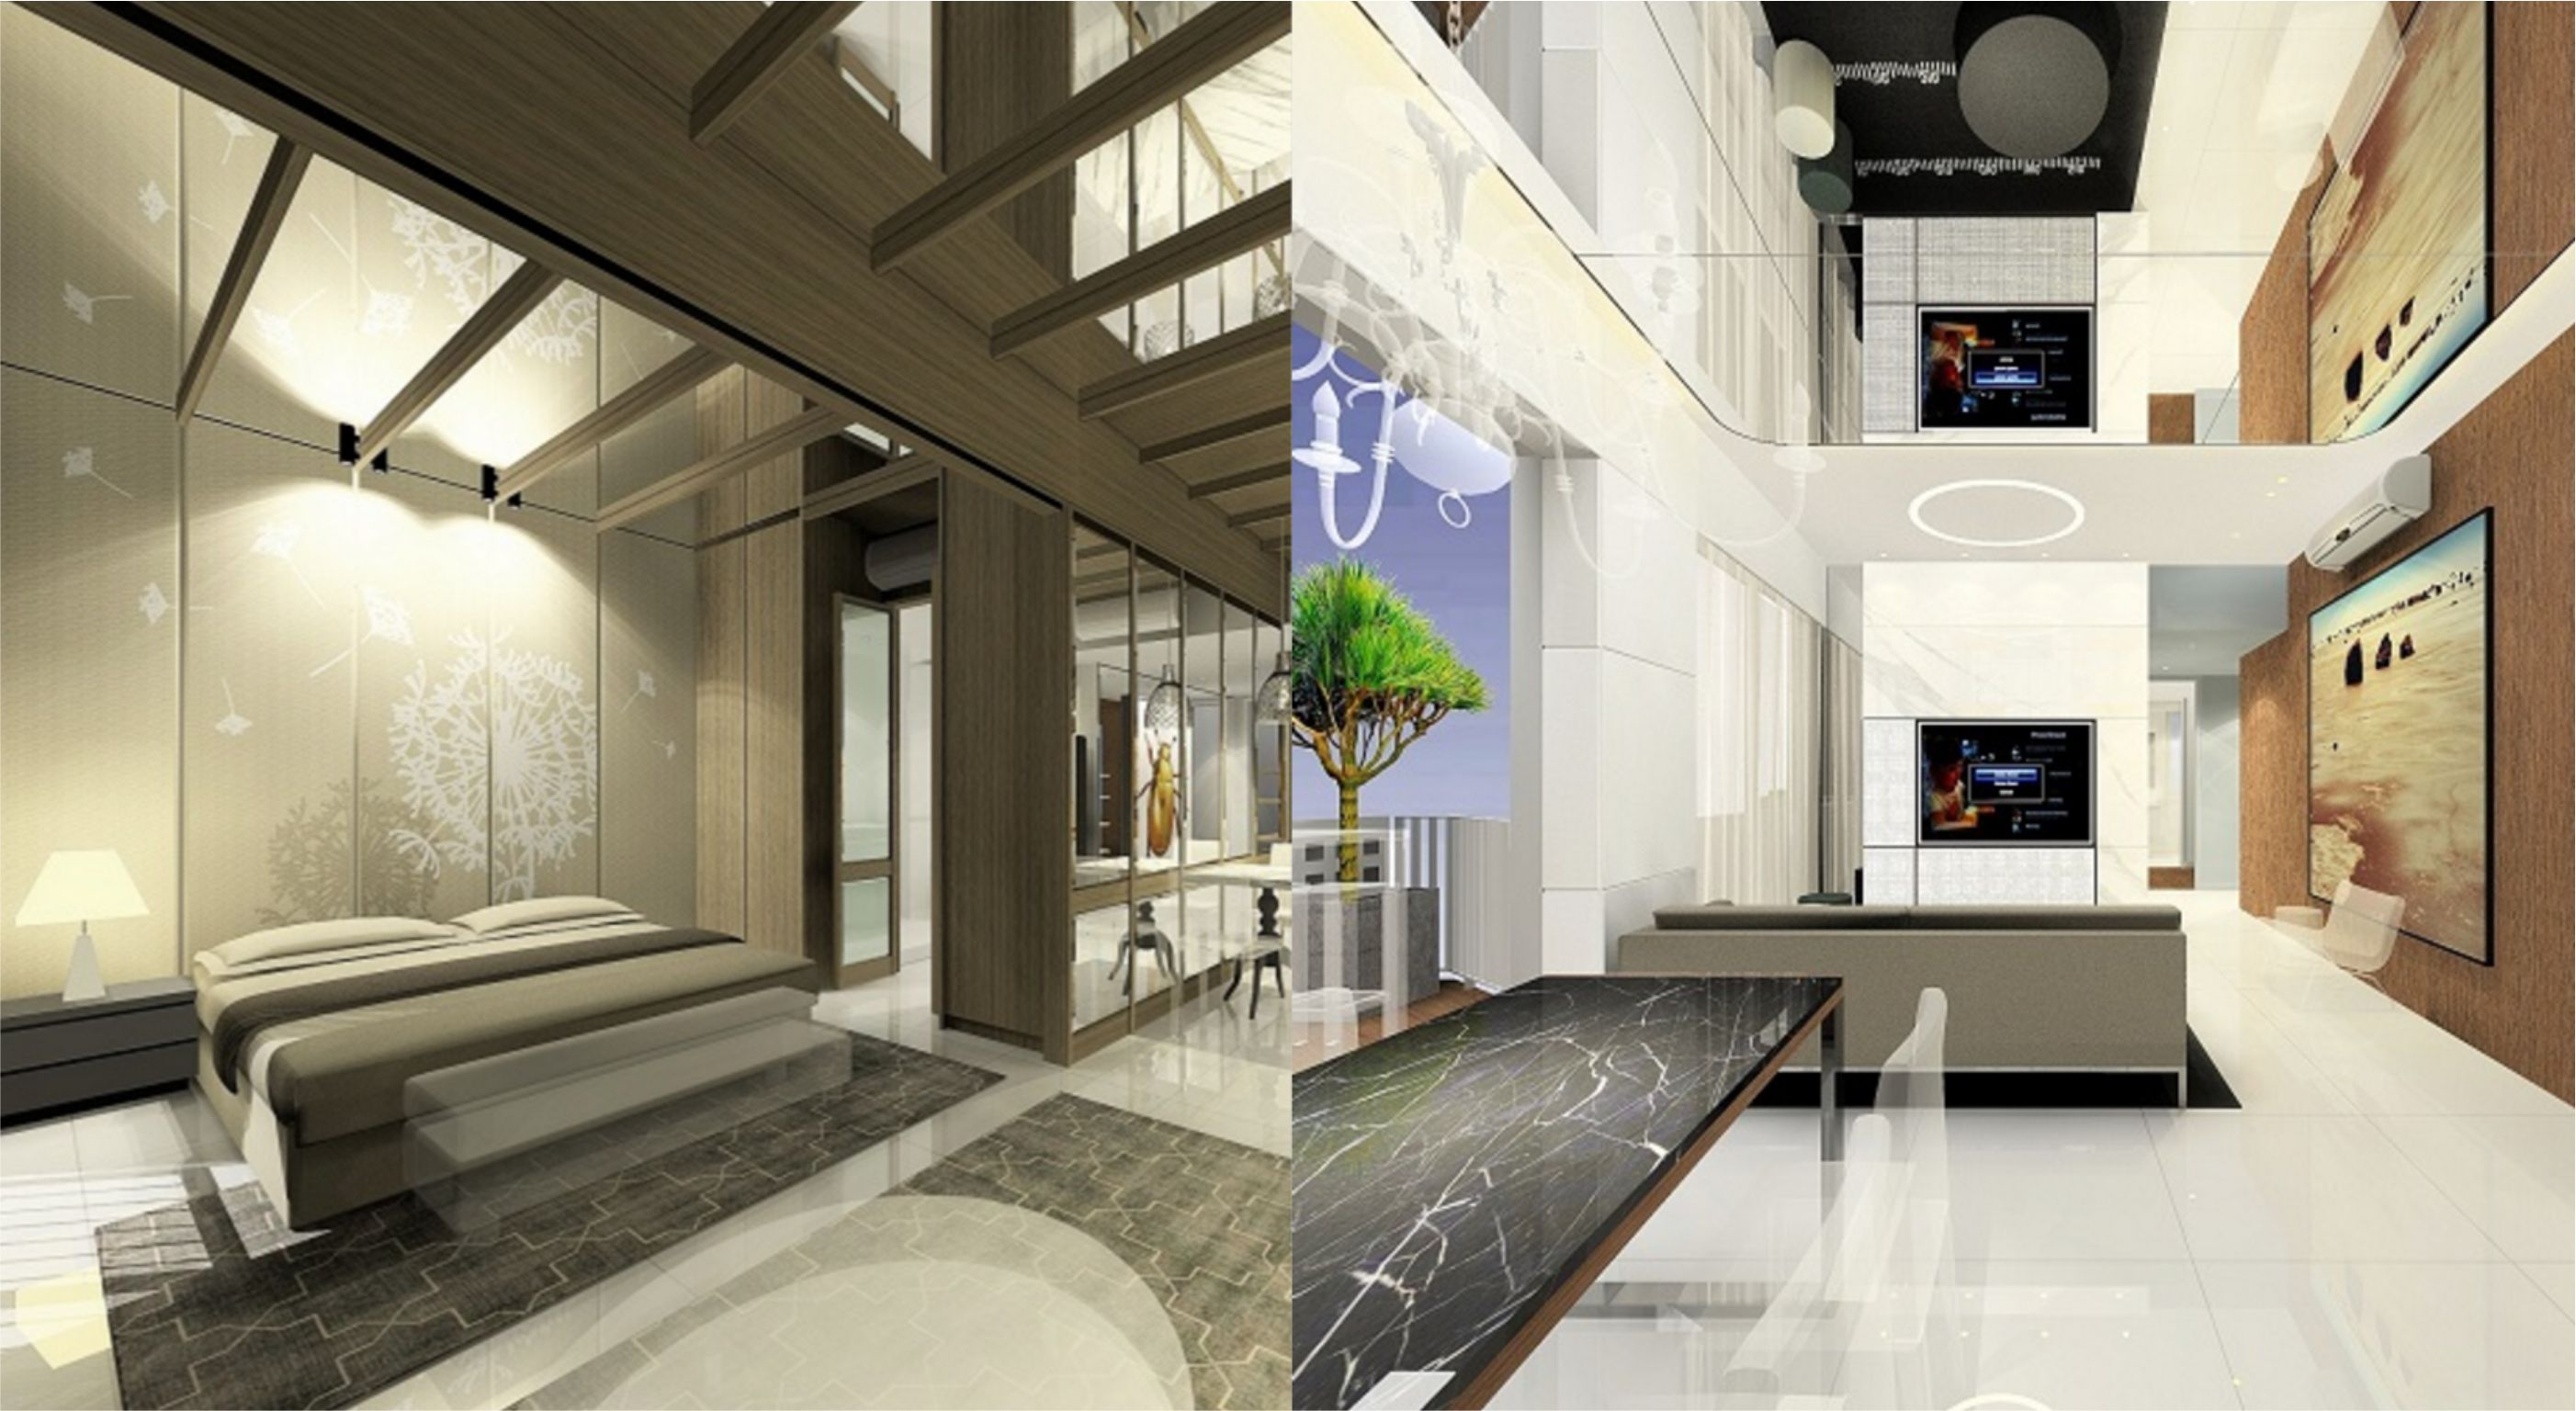 skyhabitat-interior renderings